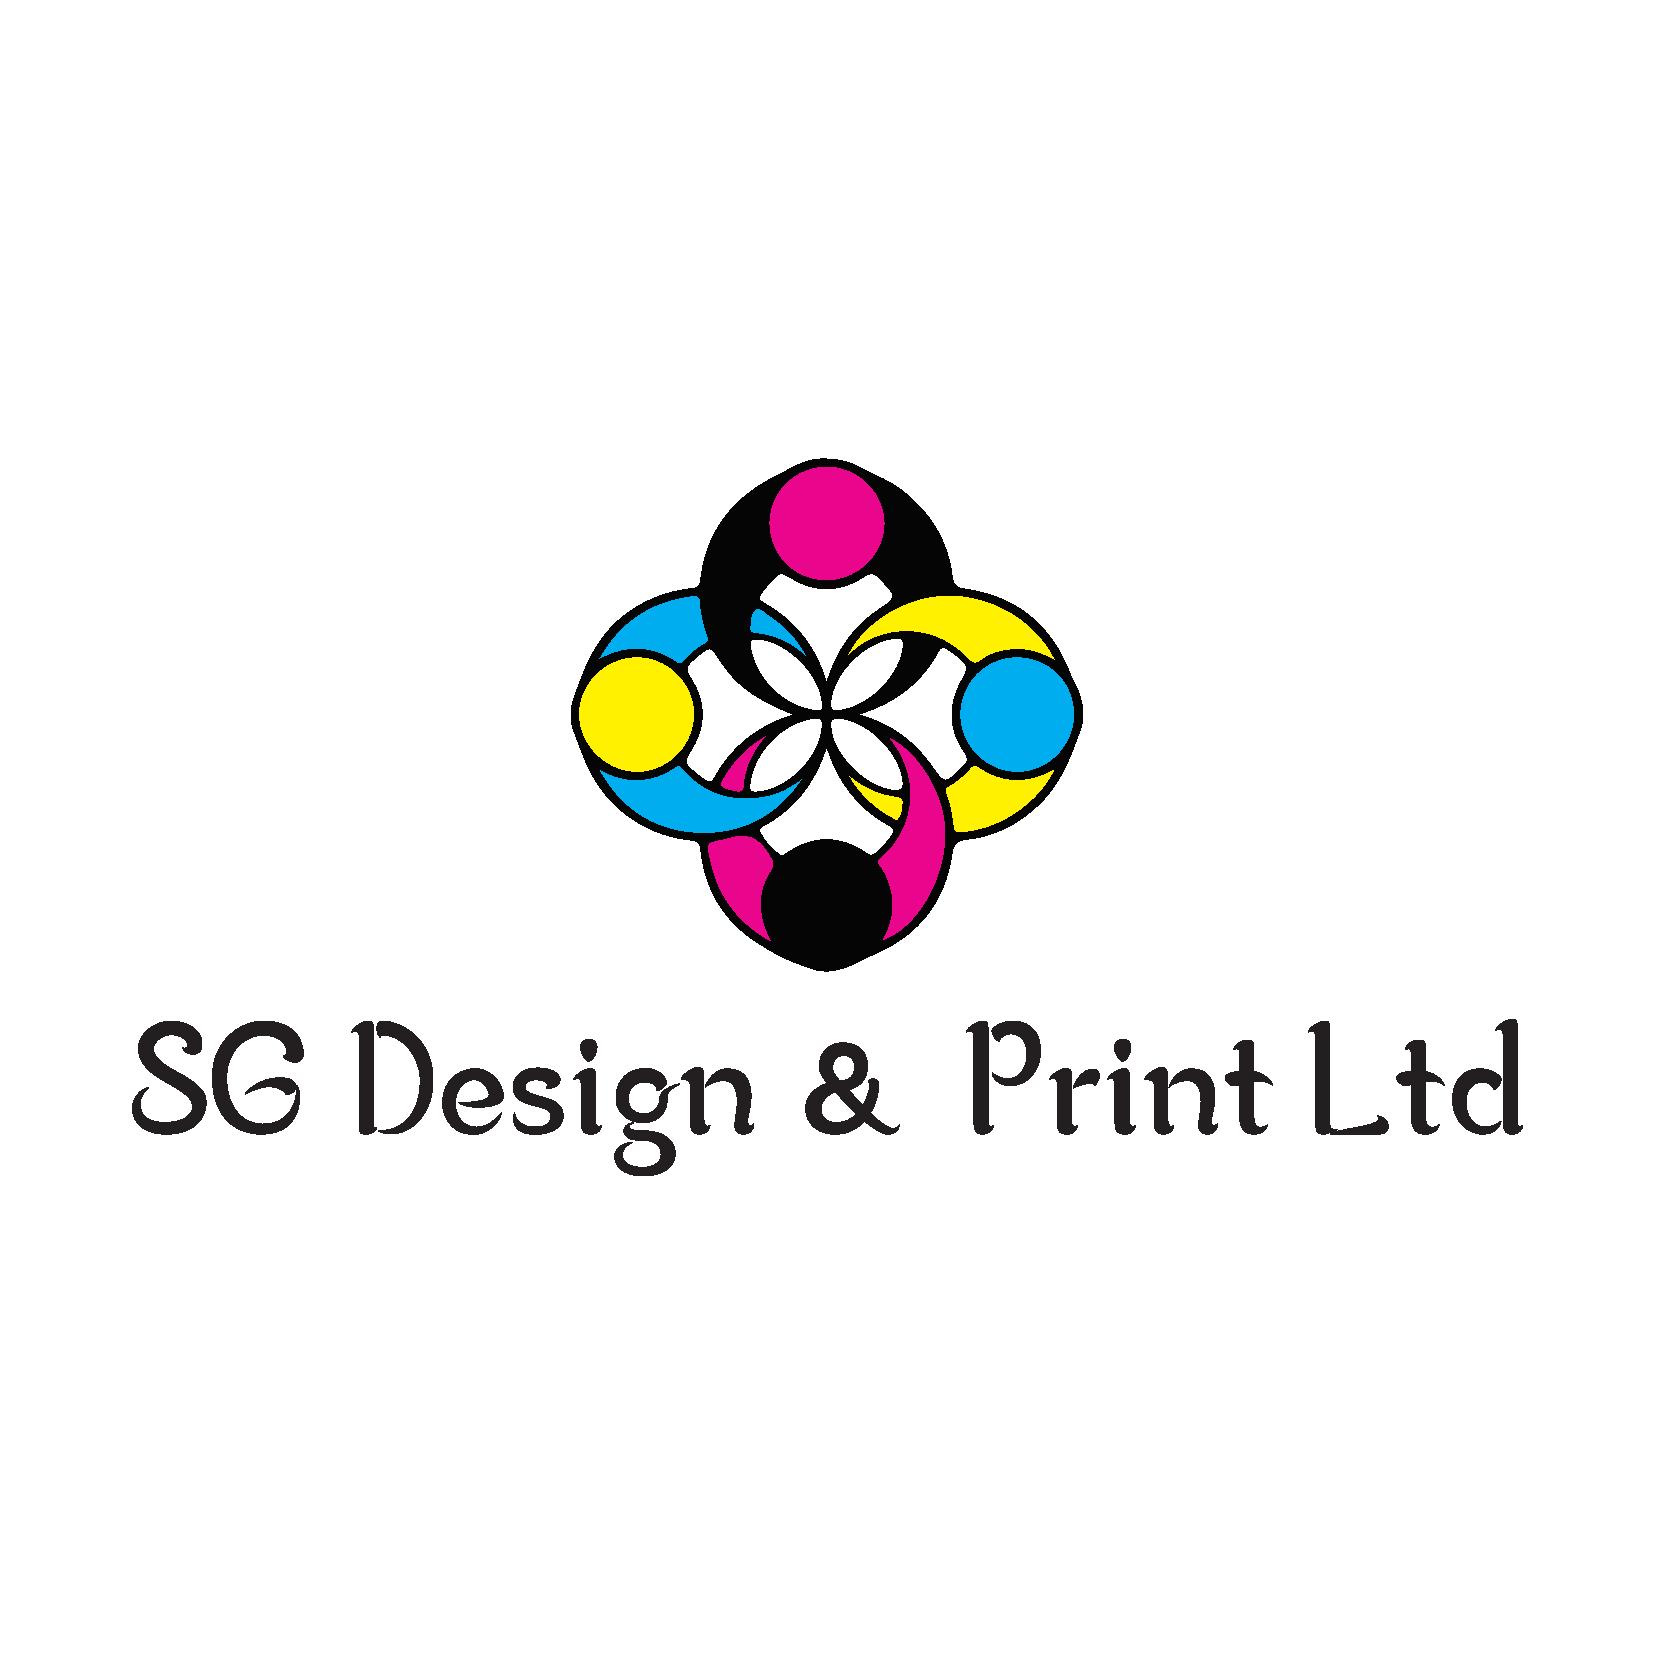 SG Design & Print Ltd